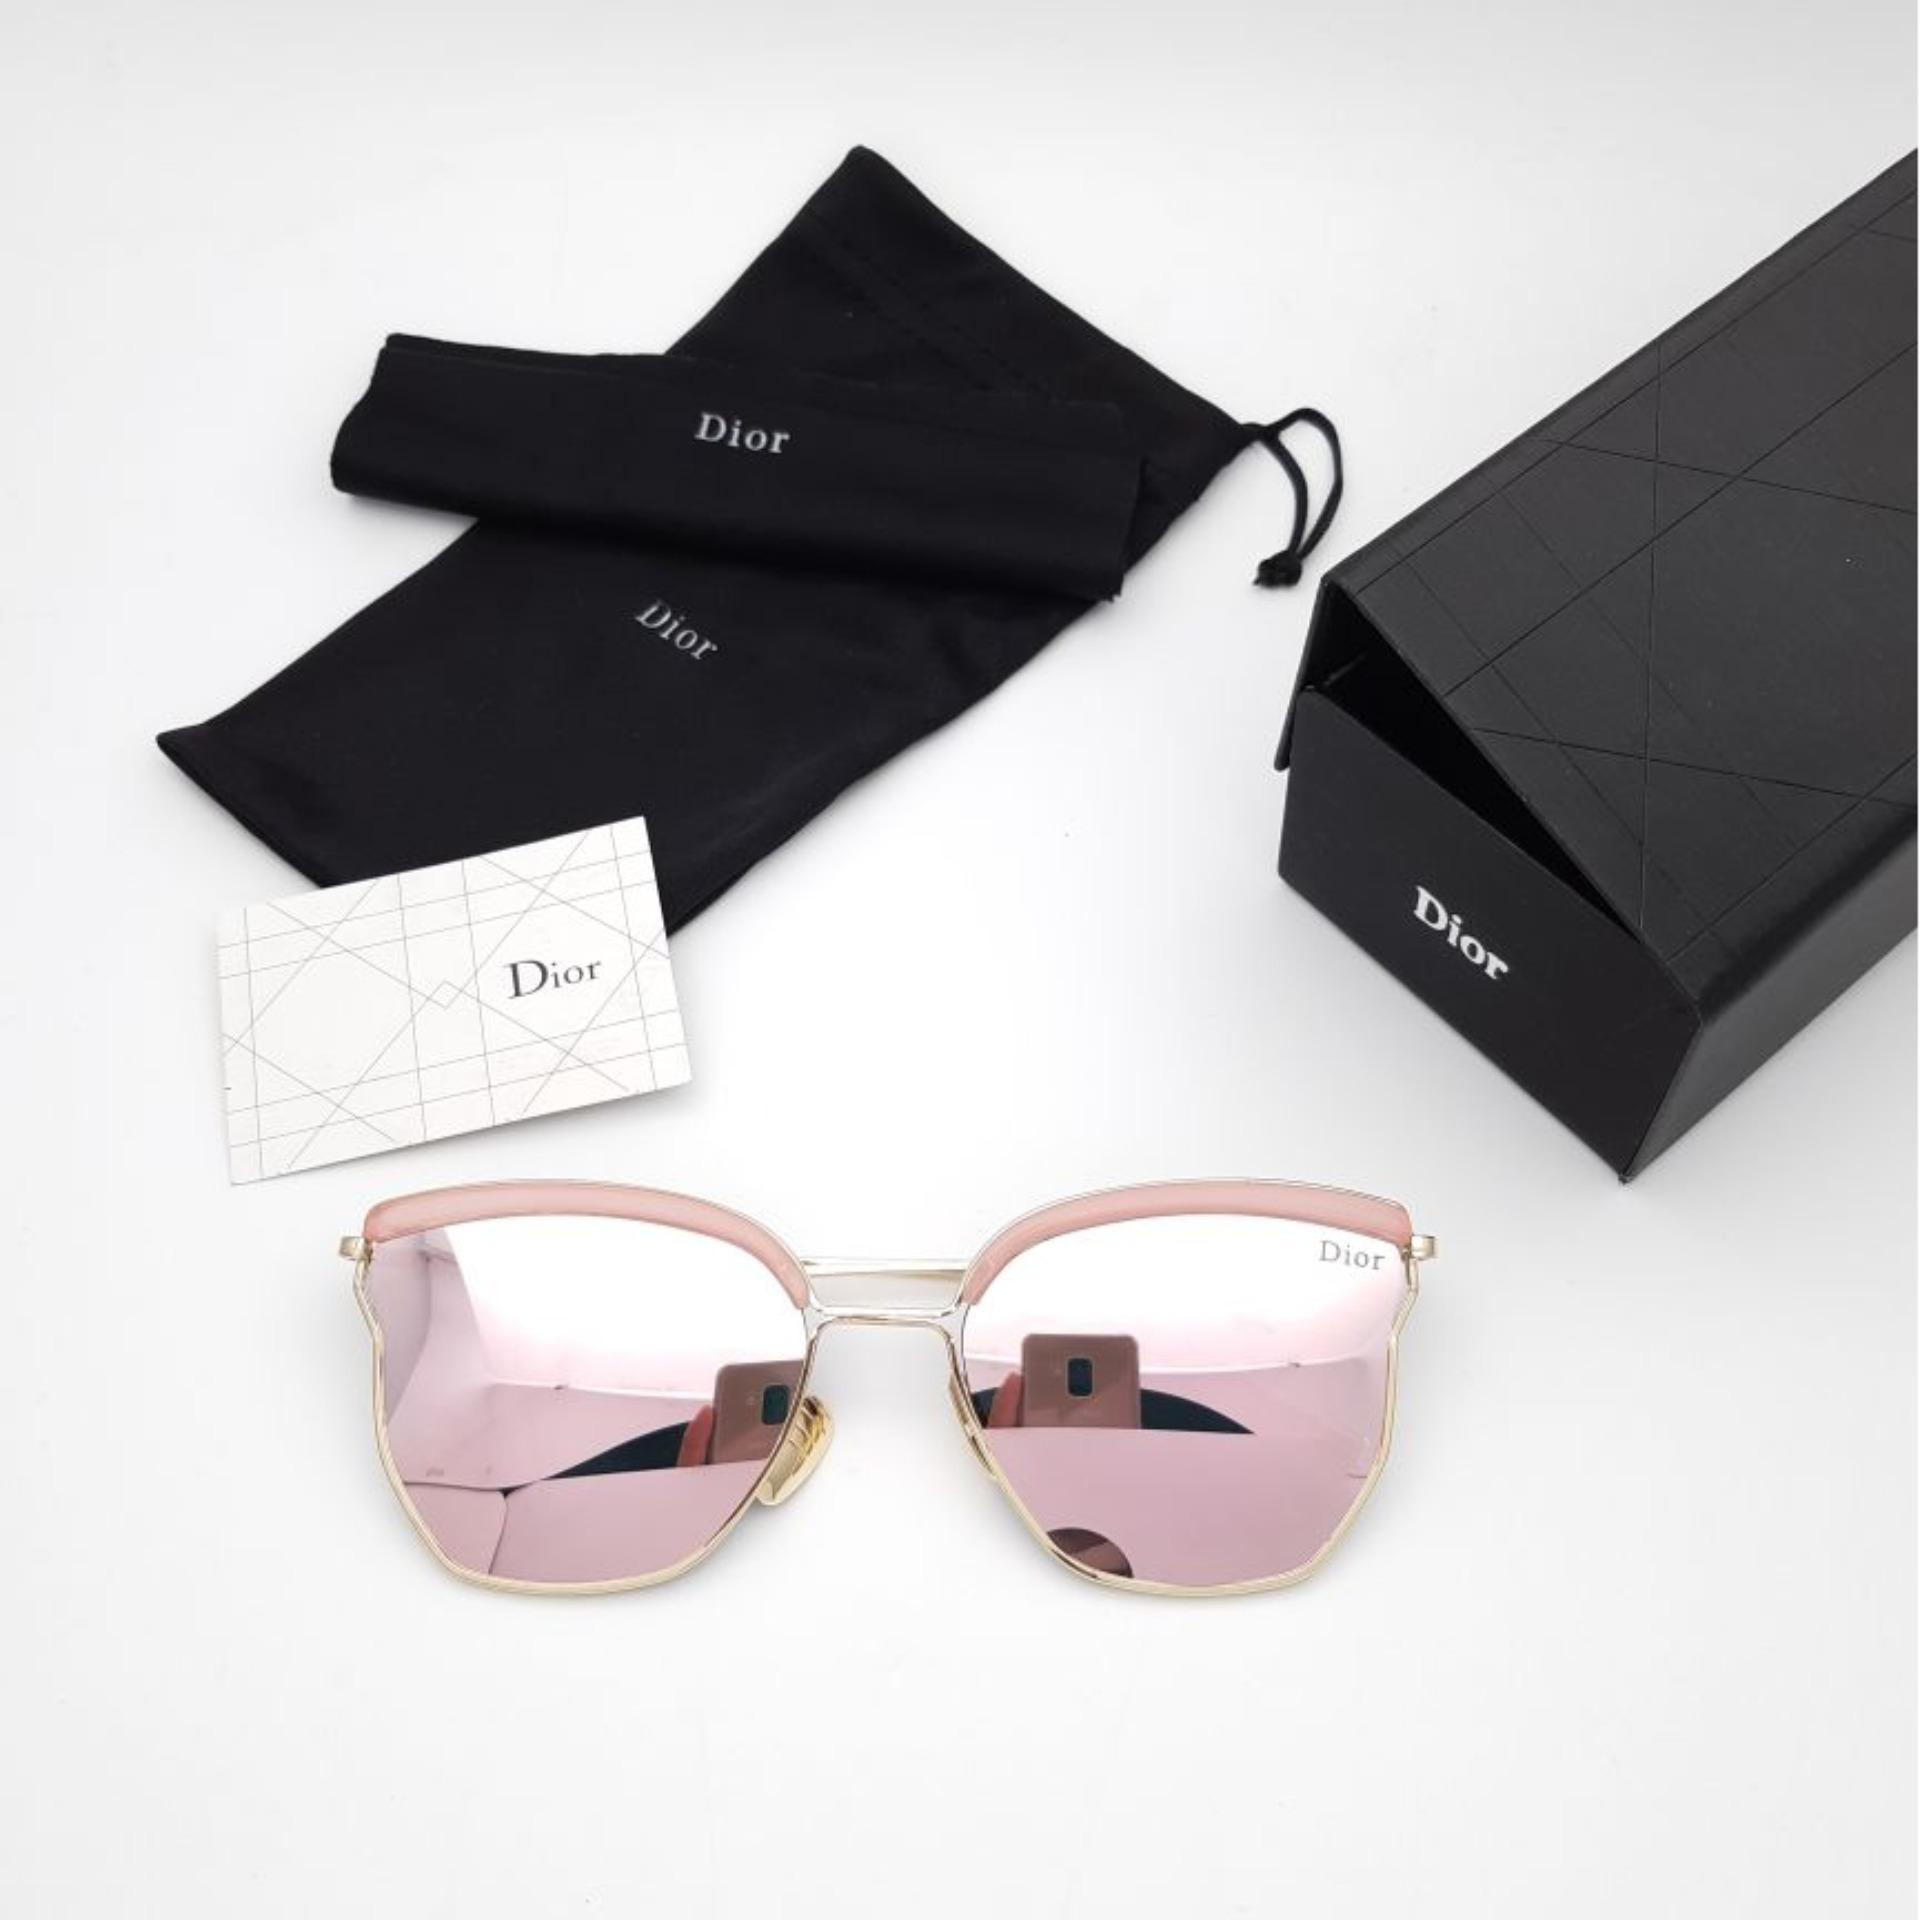 Buy Sell Cheapest Kacamata Wanita Fashionable Best Quality Product Sunglass Dior 84 Import Fashion Sunglasses Shareen Terbaru Ml